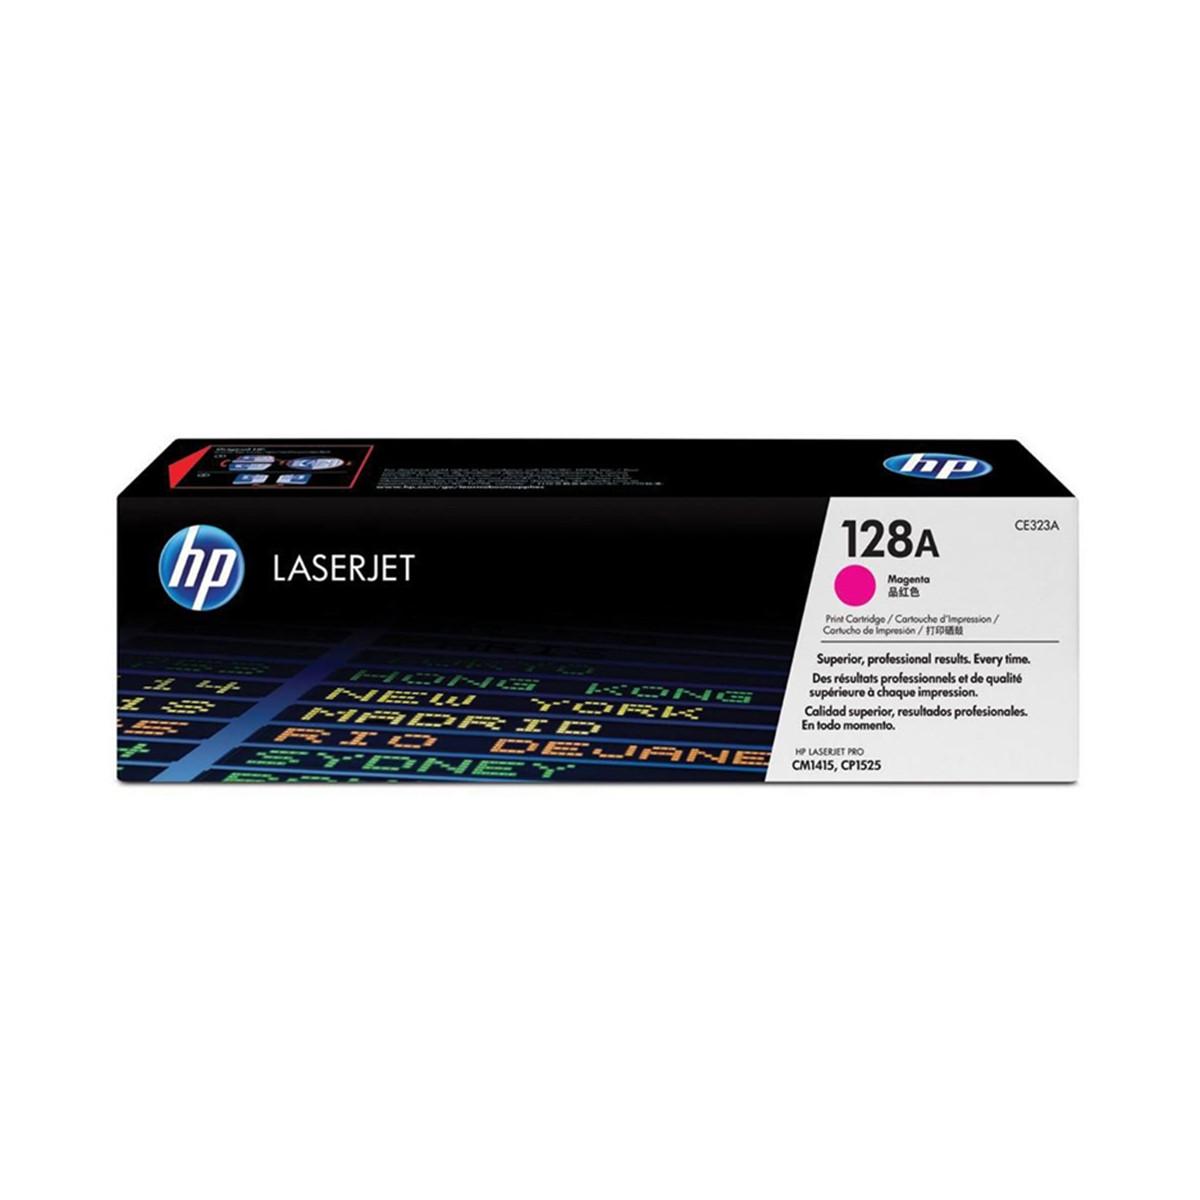 TONER 128A CE323A MAGENTA HP